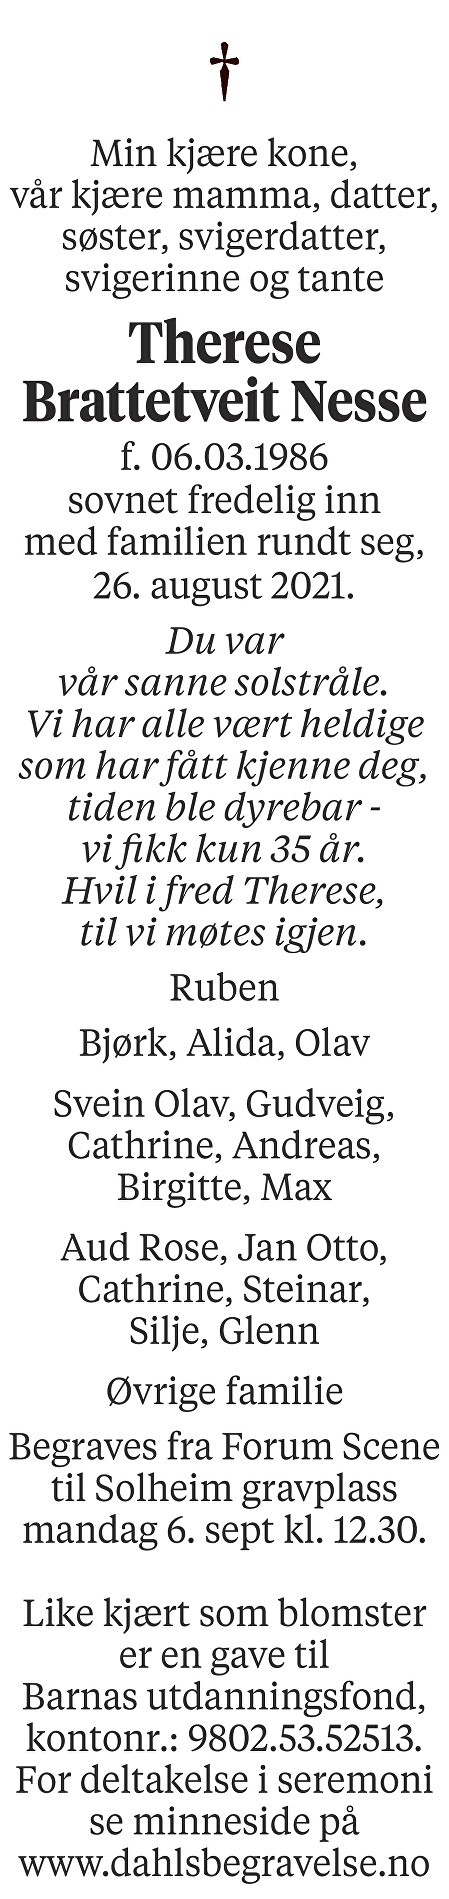 Therese Brattetveit Nesse Dødsannonse